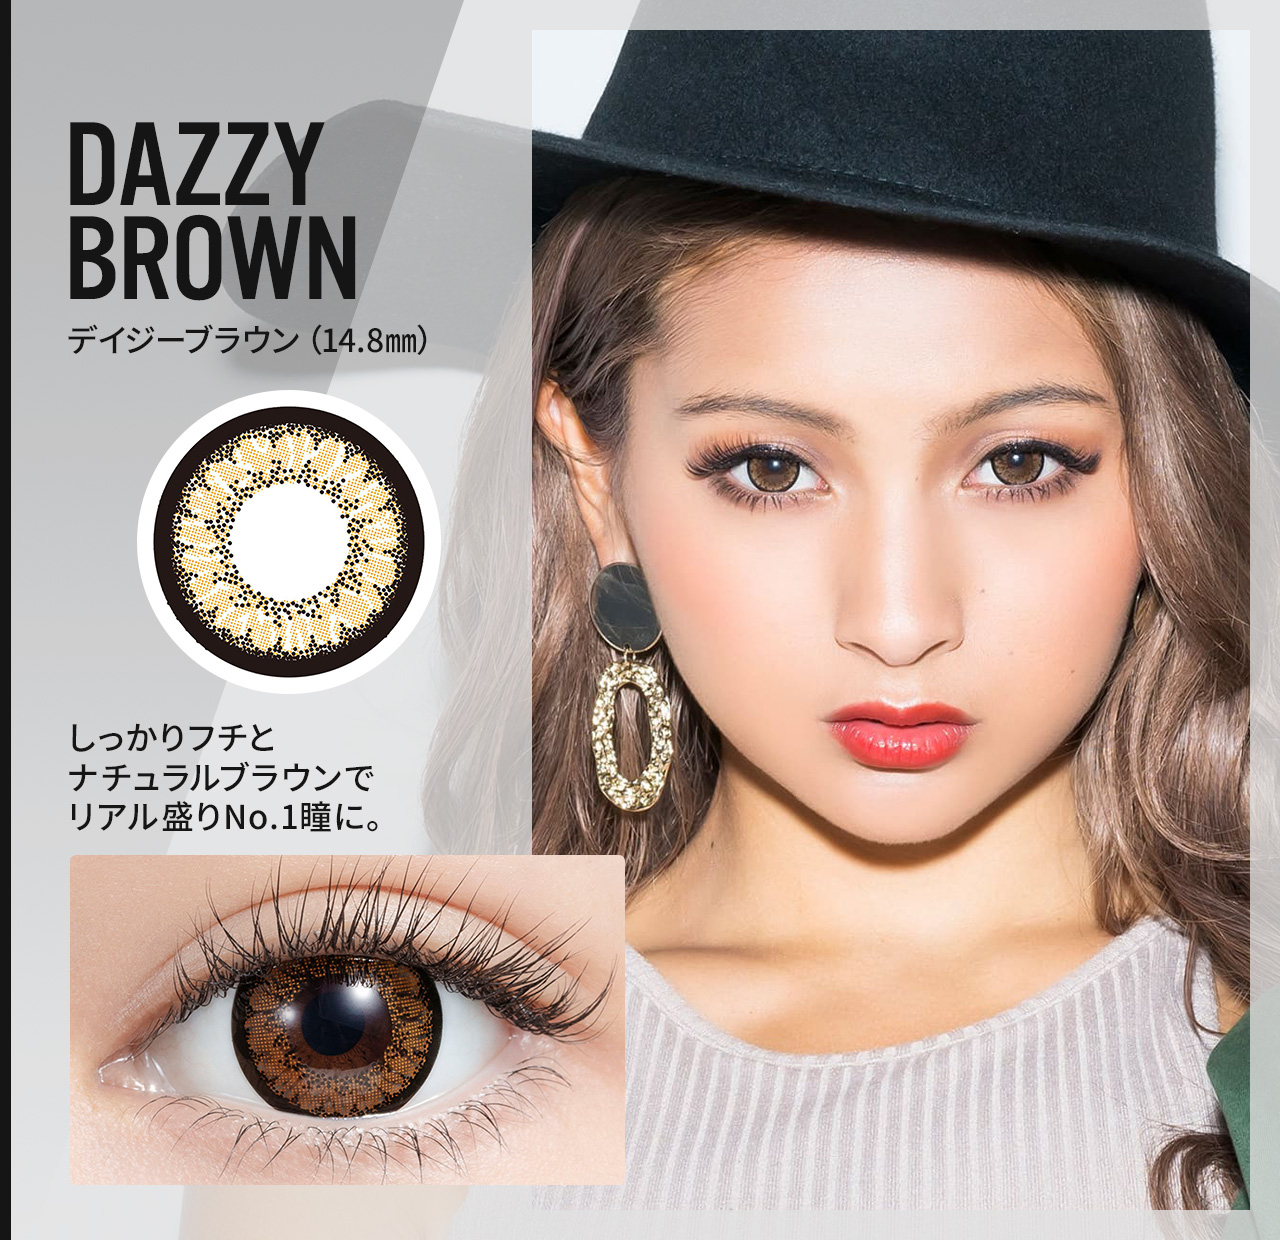 DAZZY BROWN デイジーブラウン